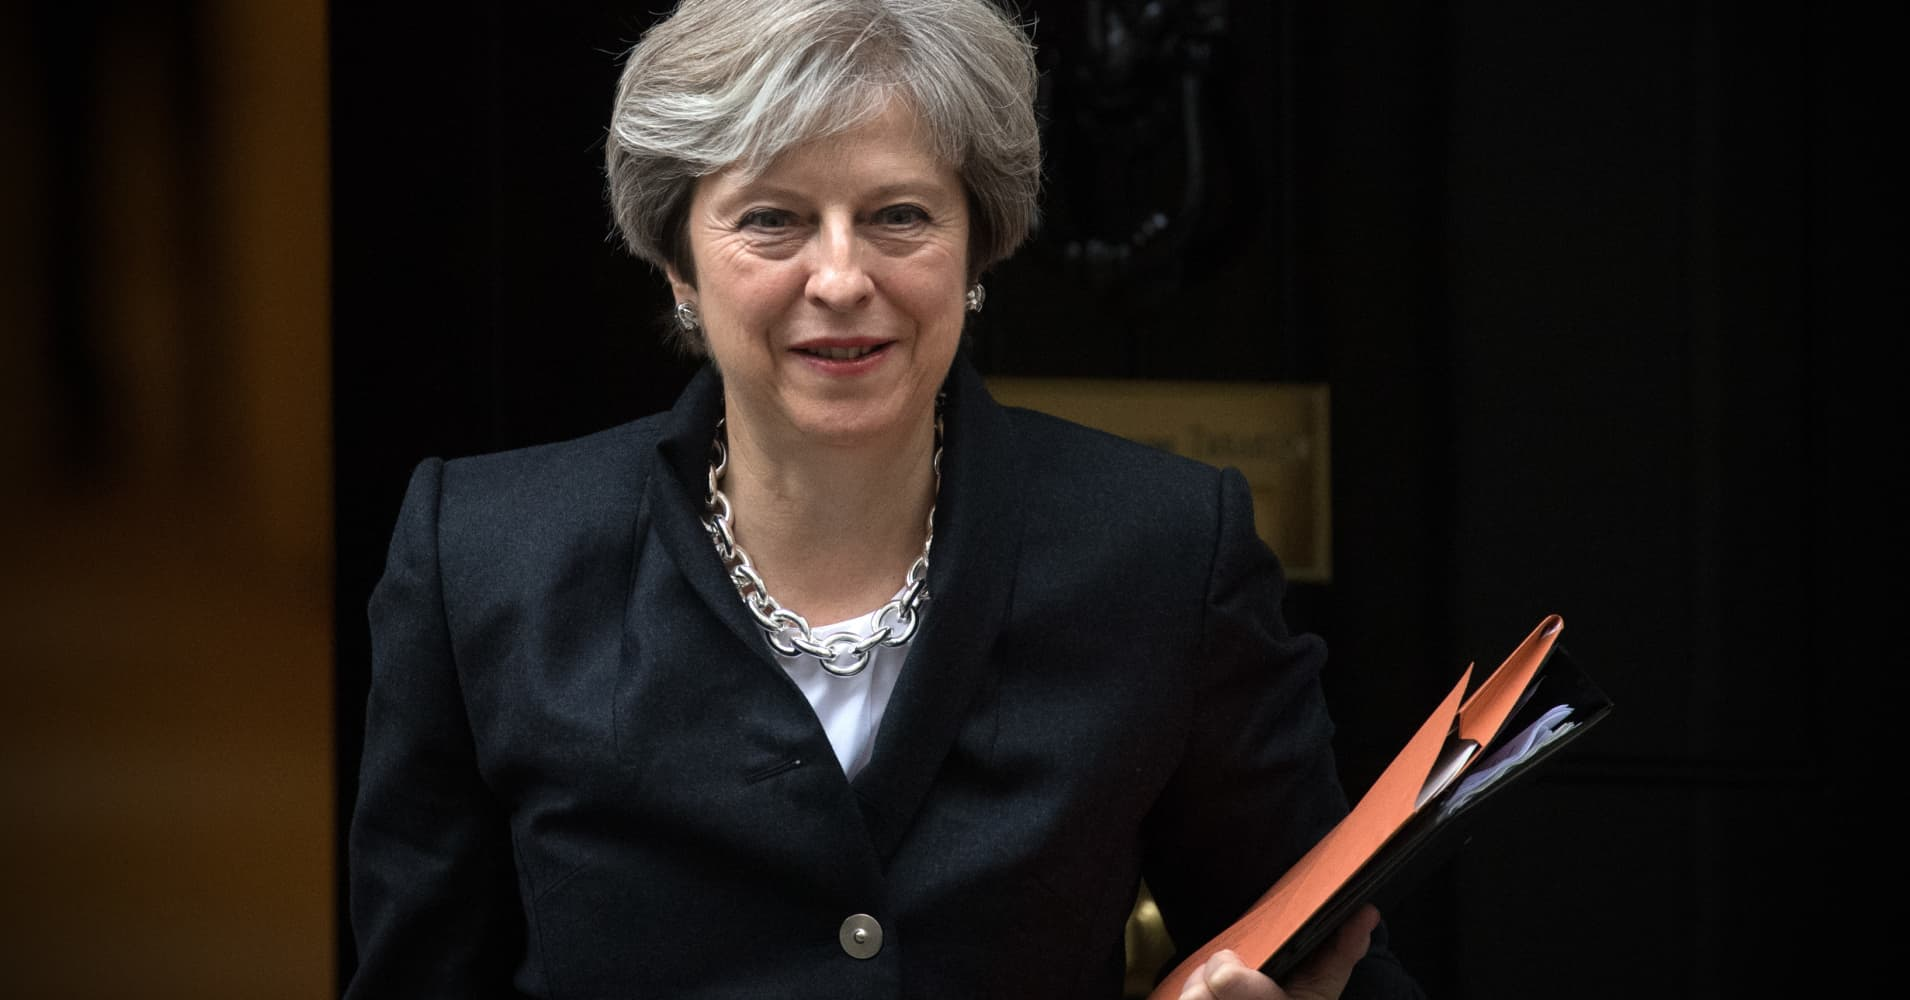 After winning leadership vote, Theresa May heads to Brussels to debate Irish border